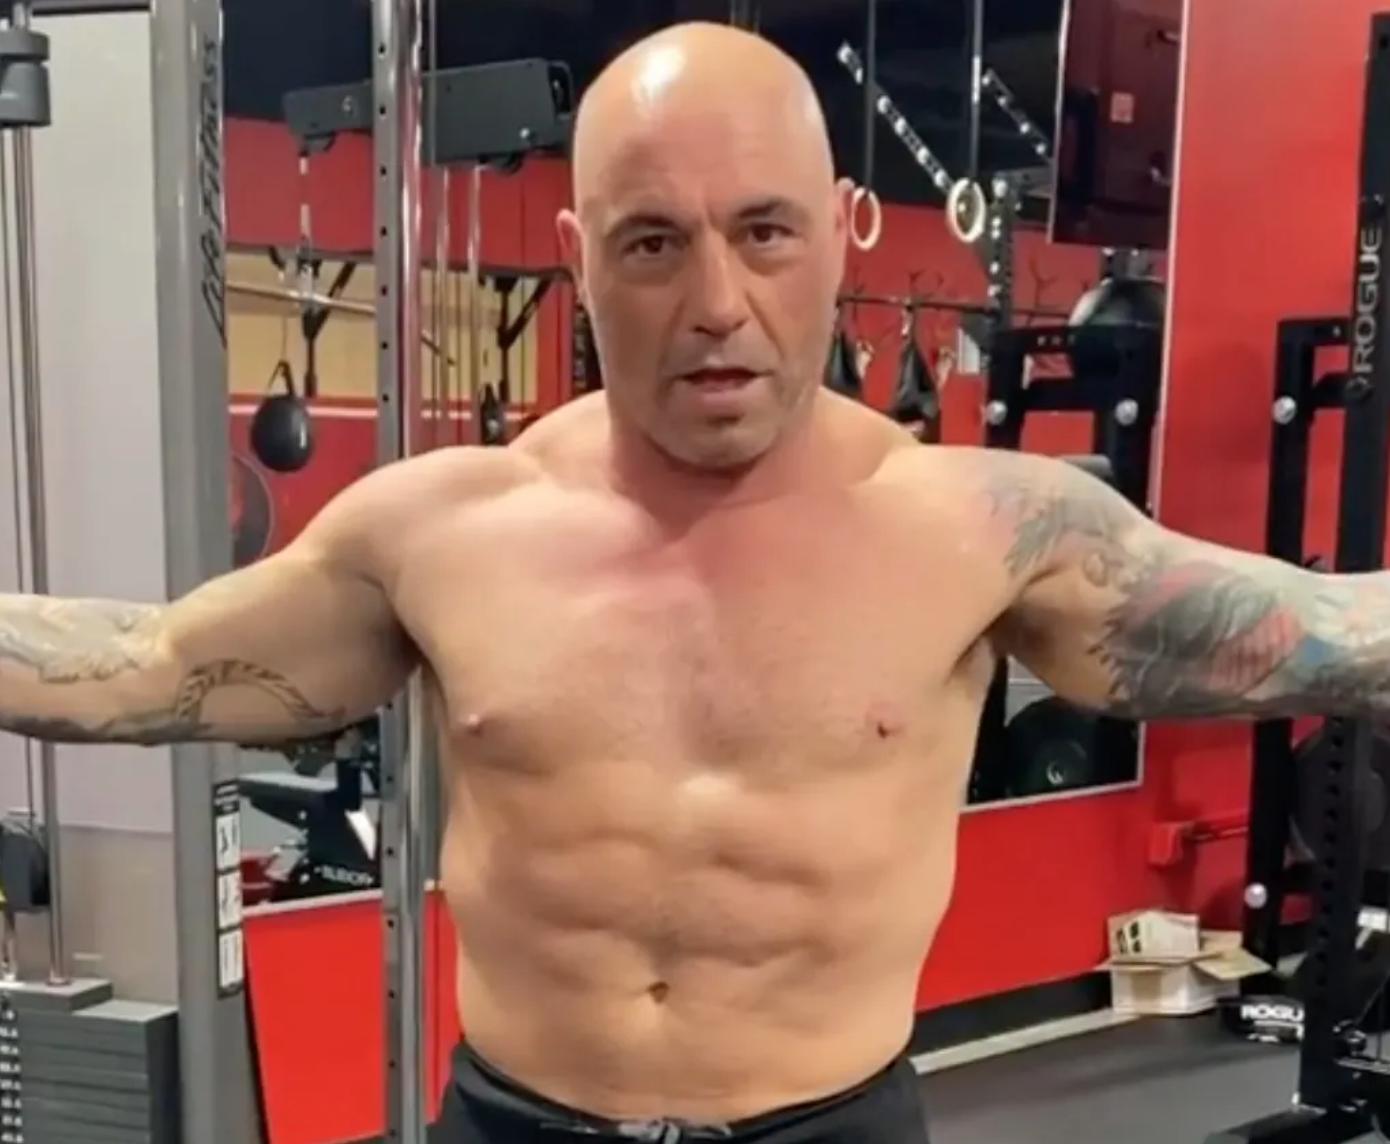 Joe Rogan's physique after carnivore diet.